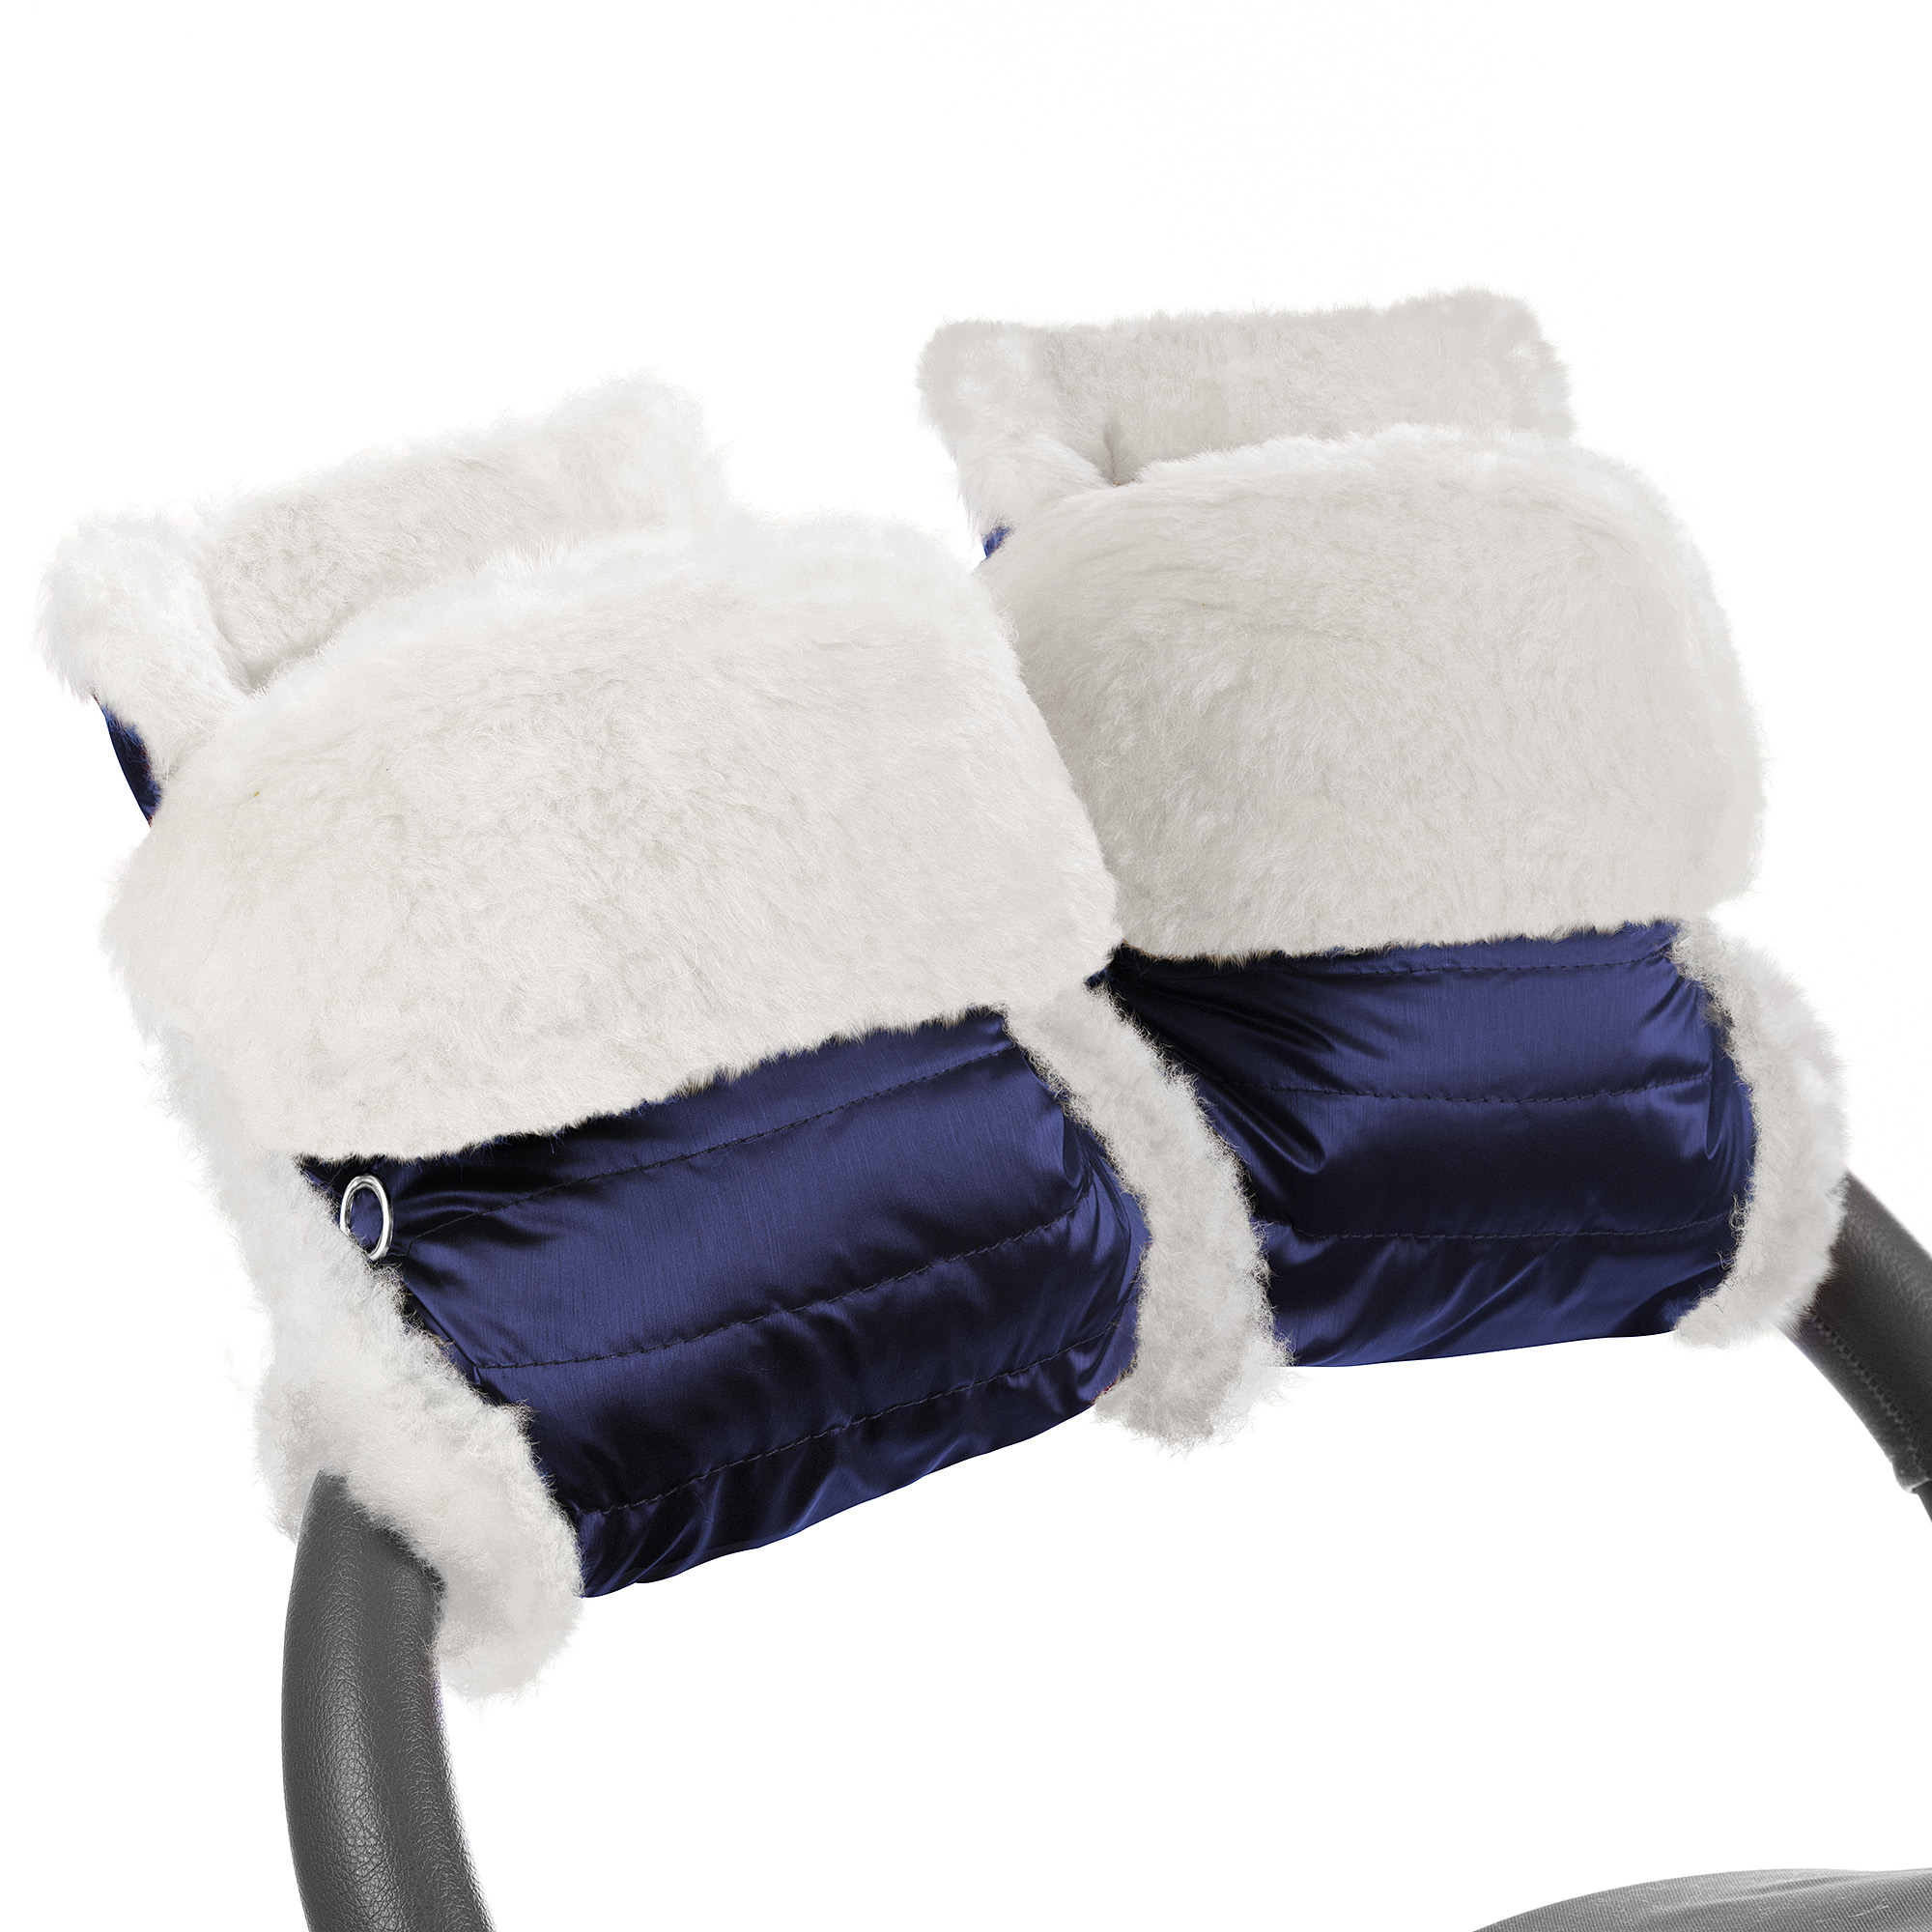 Муфта рукавички для коляски Esspero Christer Cosmic